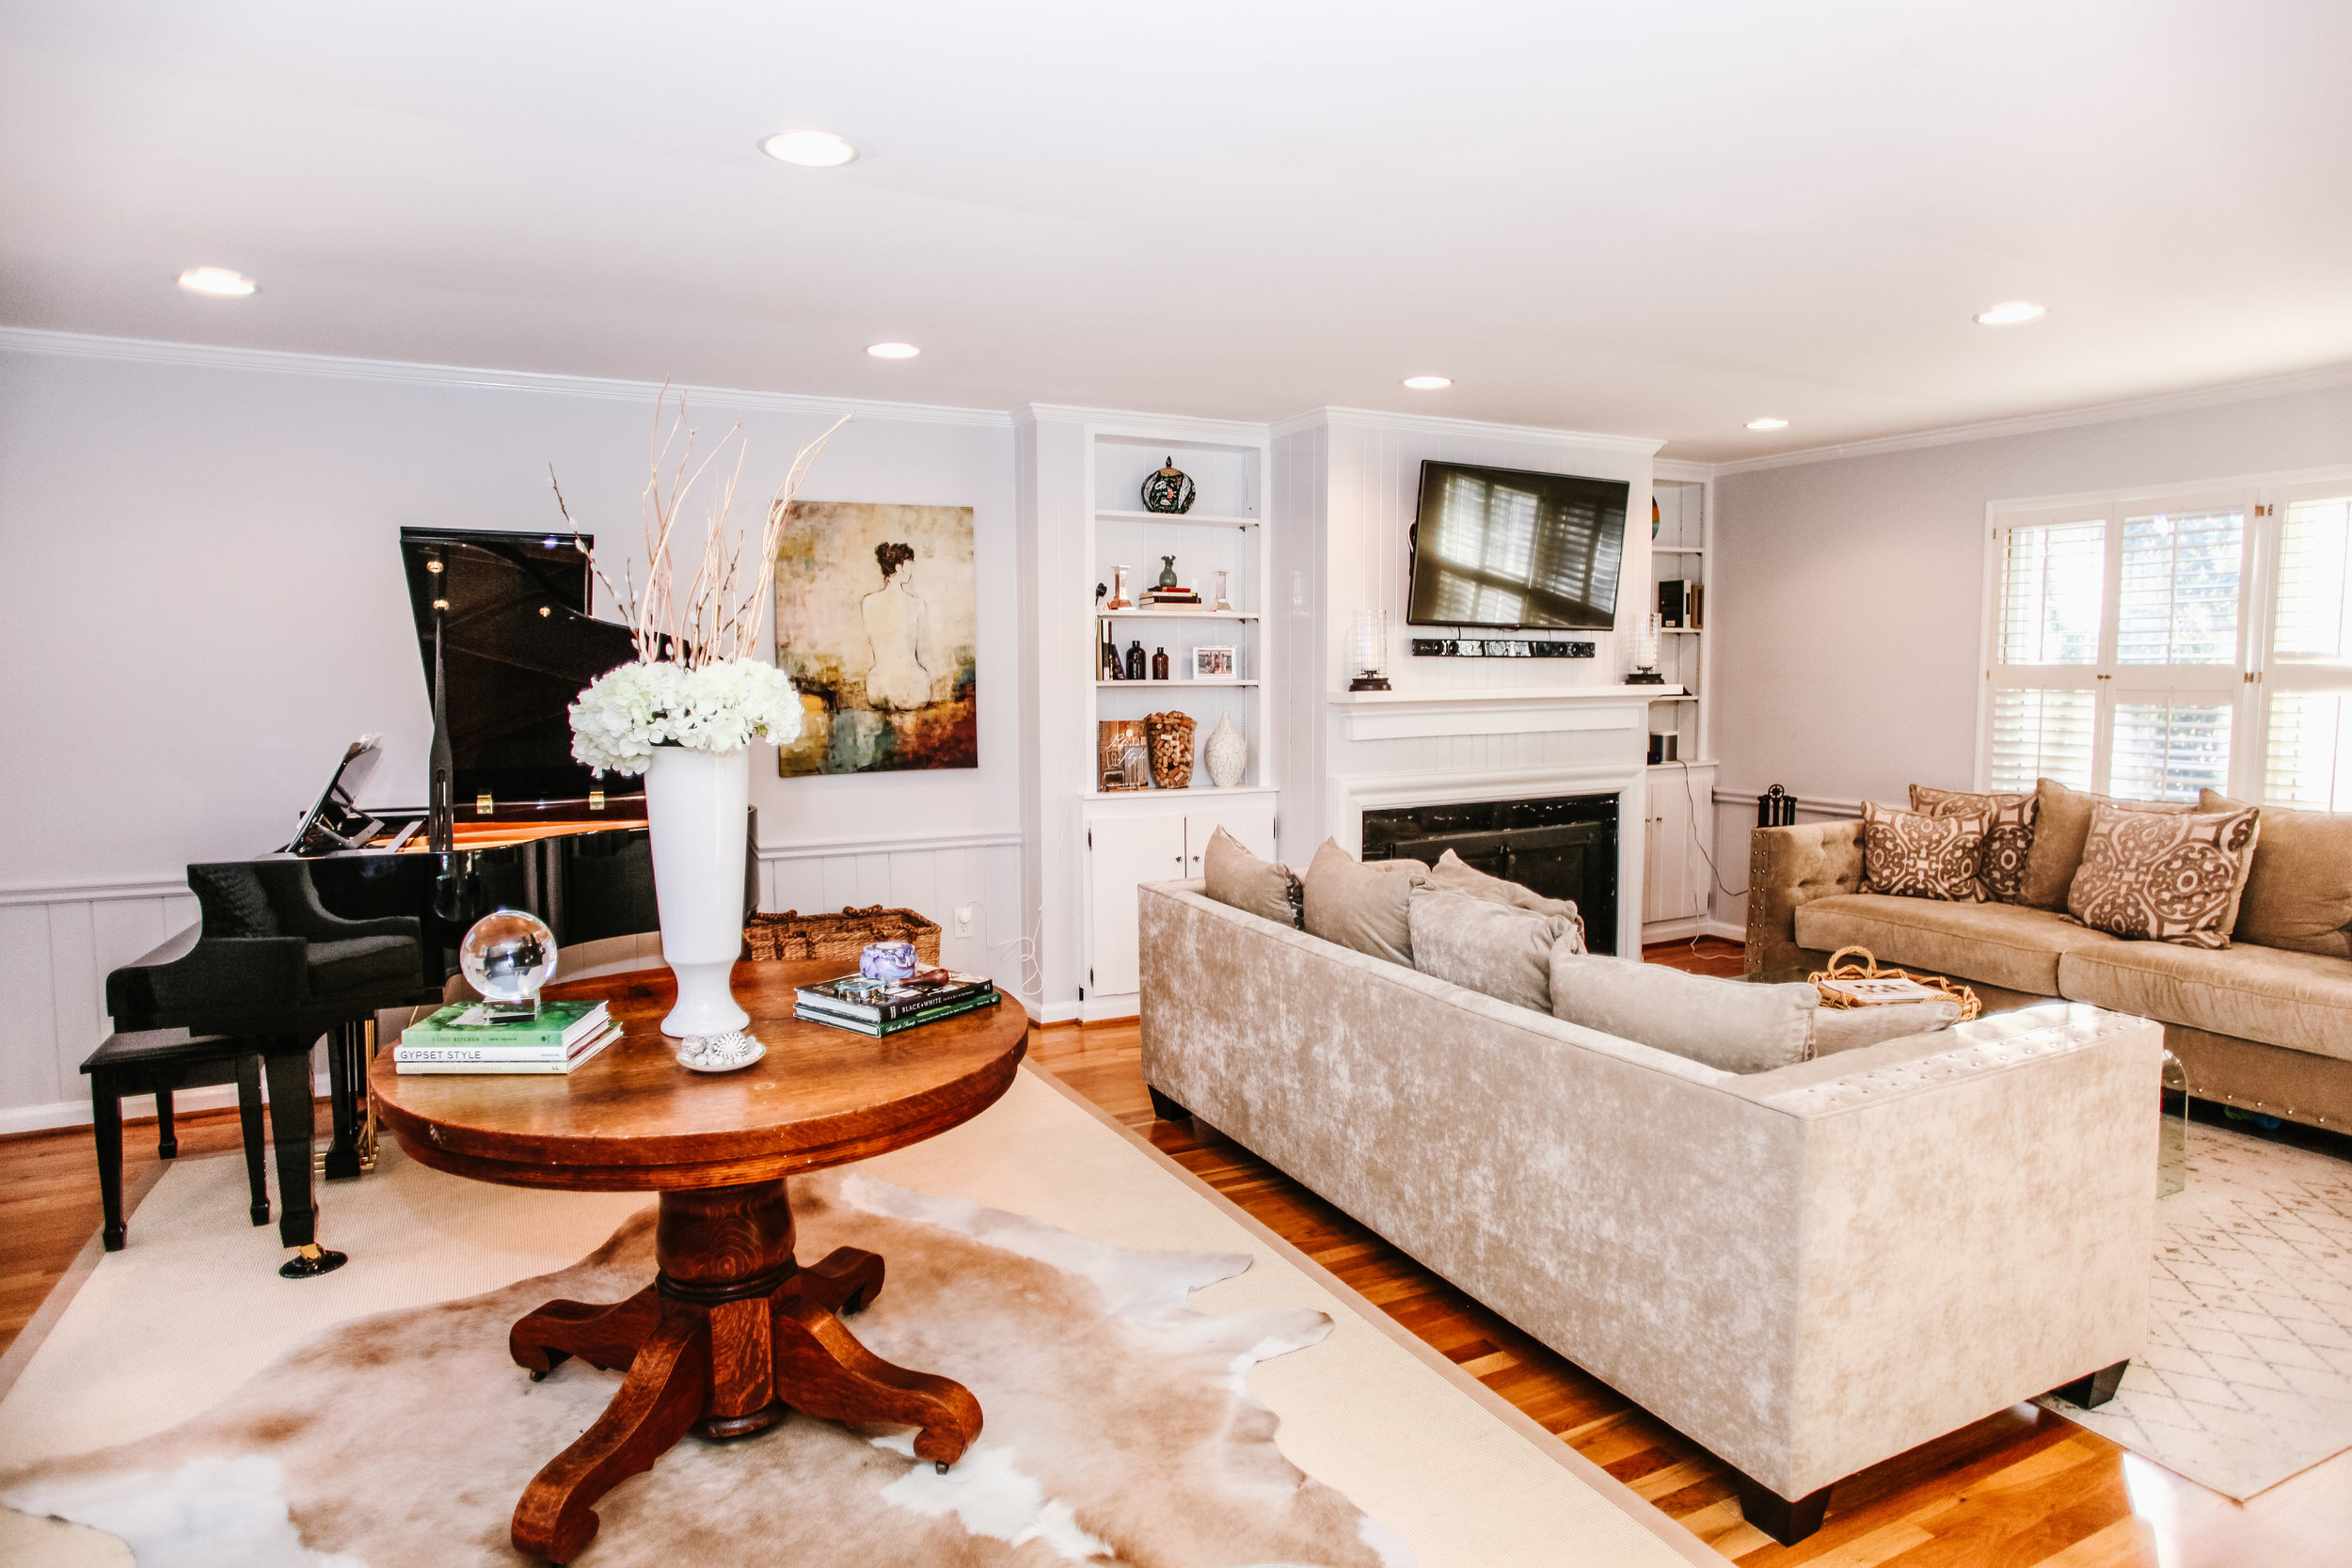 wingard-real-estate-sandy-springs-dream-home-backyard-goals-atlanta-buckhead-54.jpg